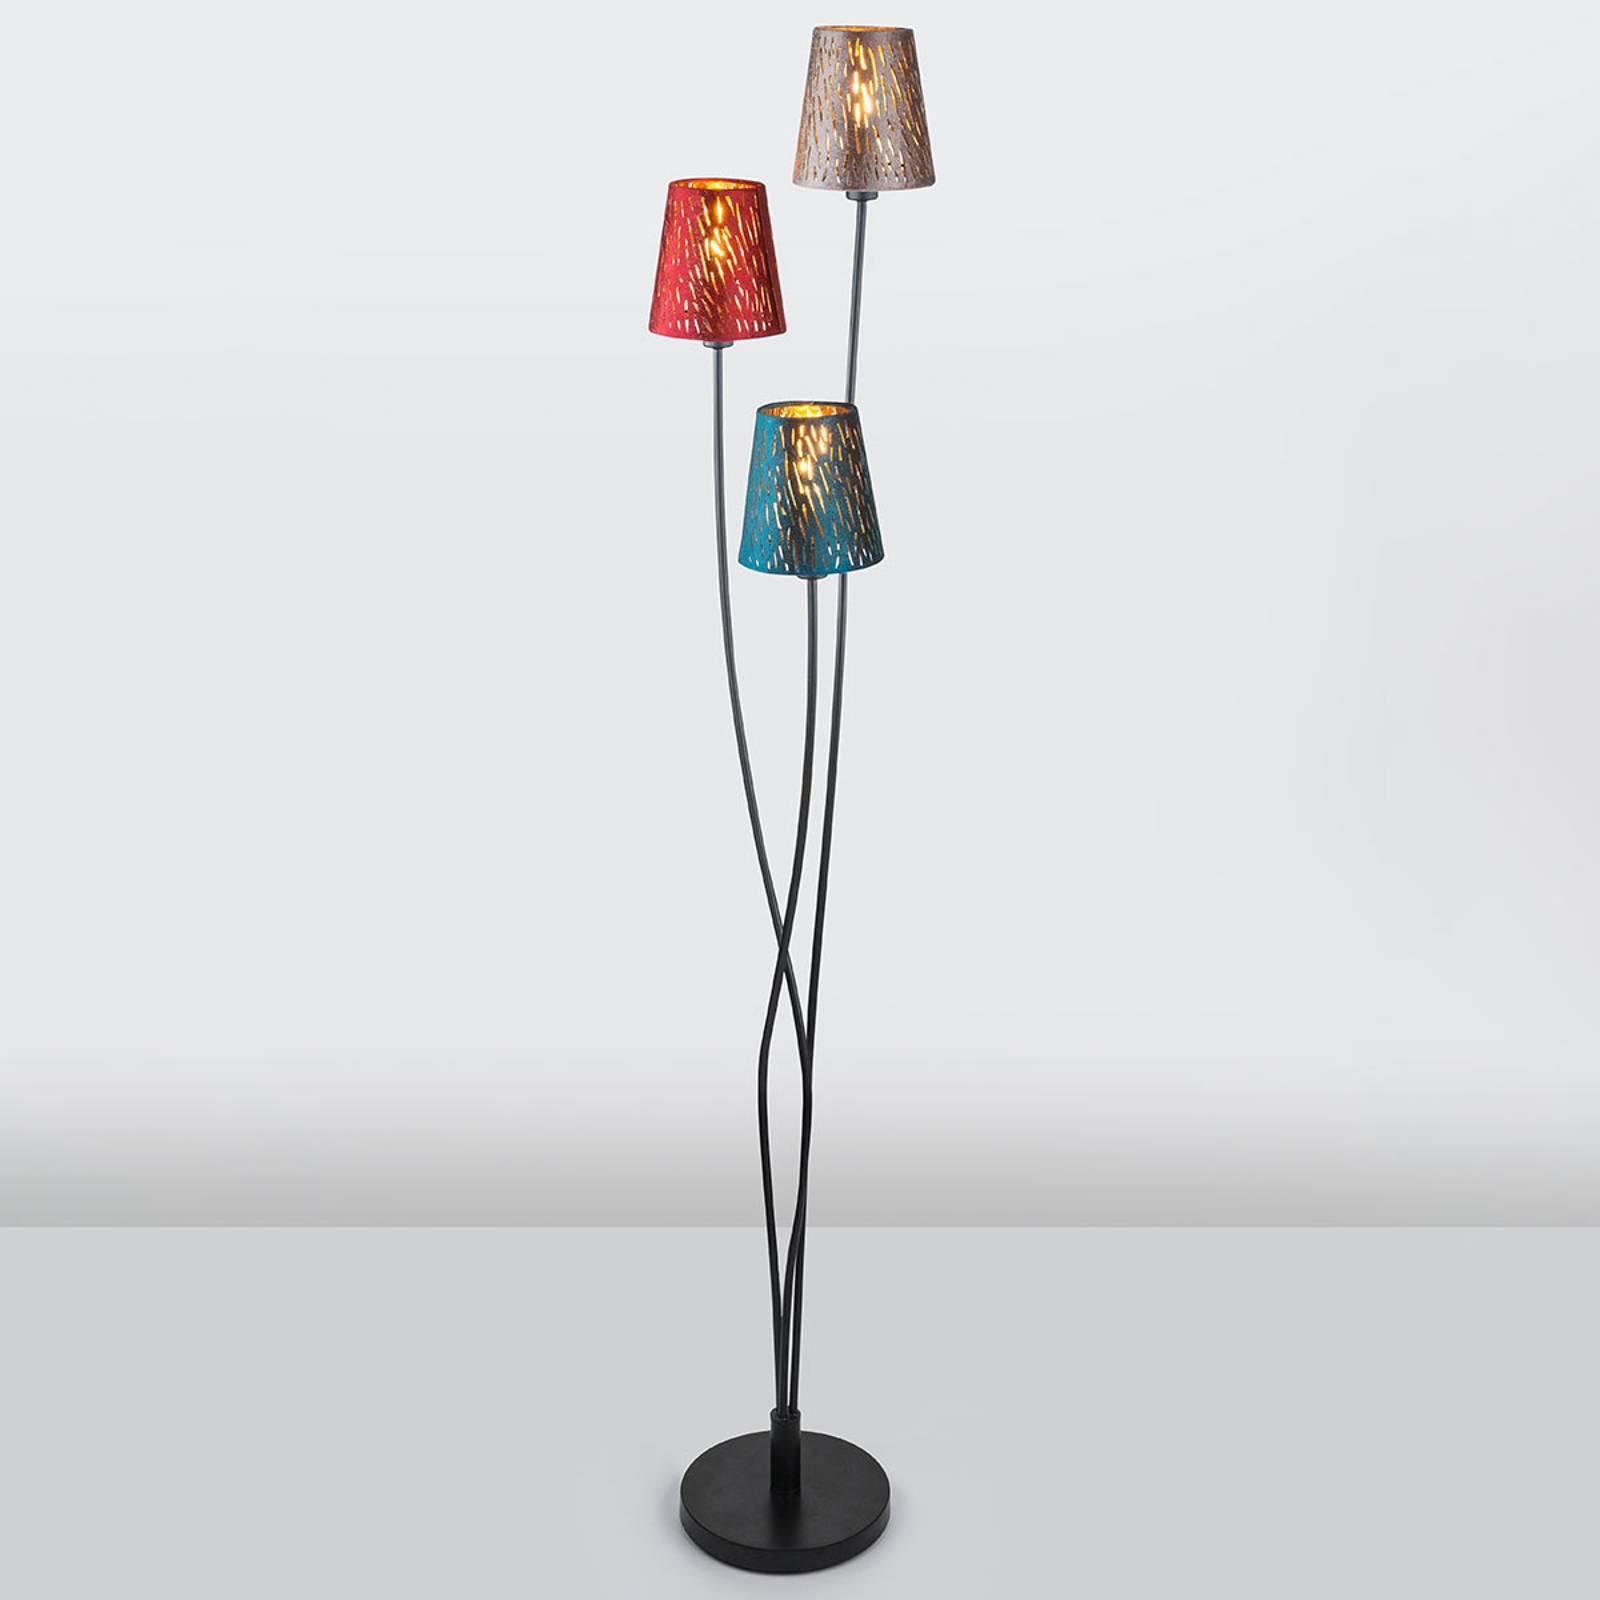 Vloerlamp Ticon 3-lamps